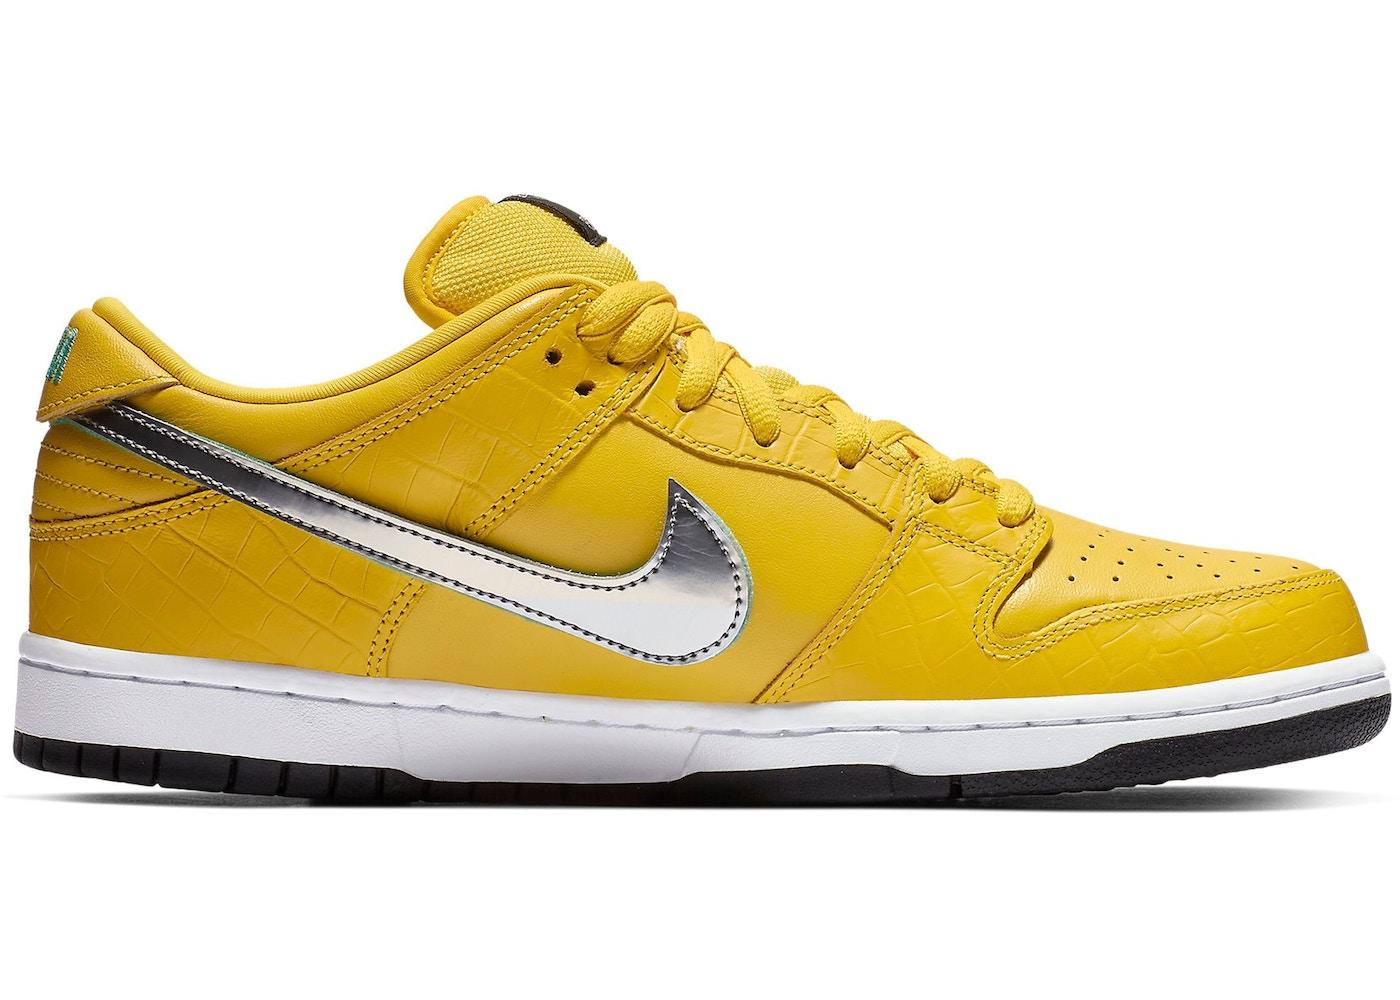 Nike SB Dunk Low Diamond Supply Co Yellow Diamond